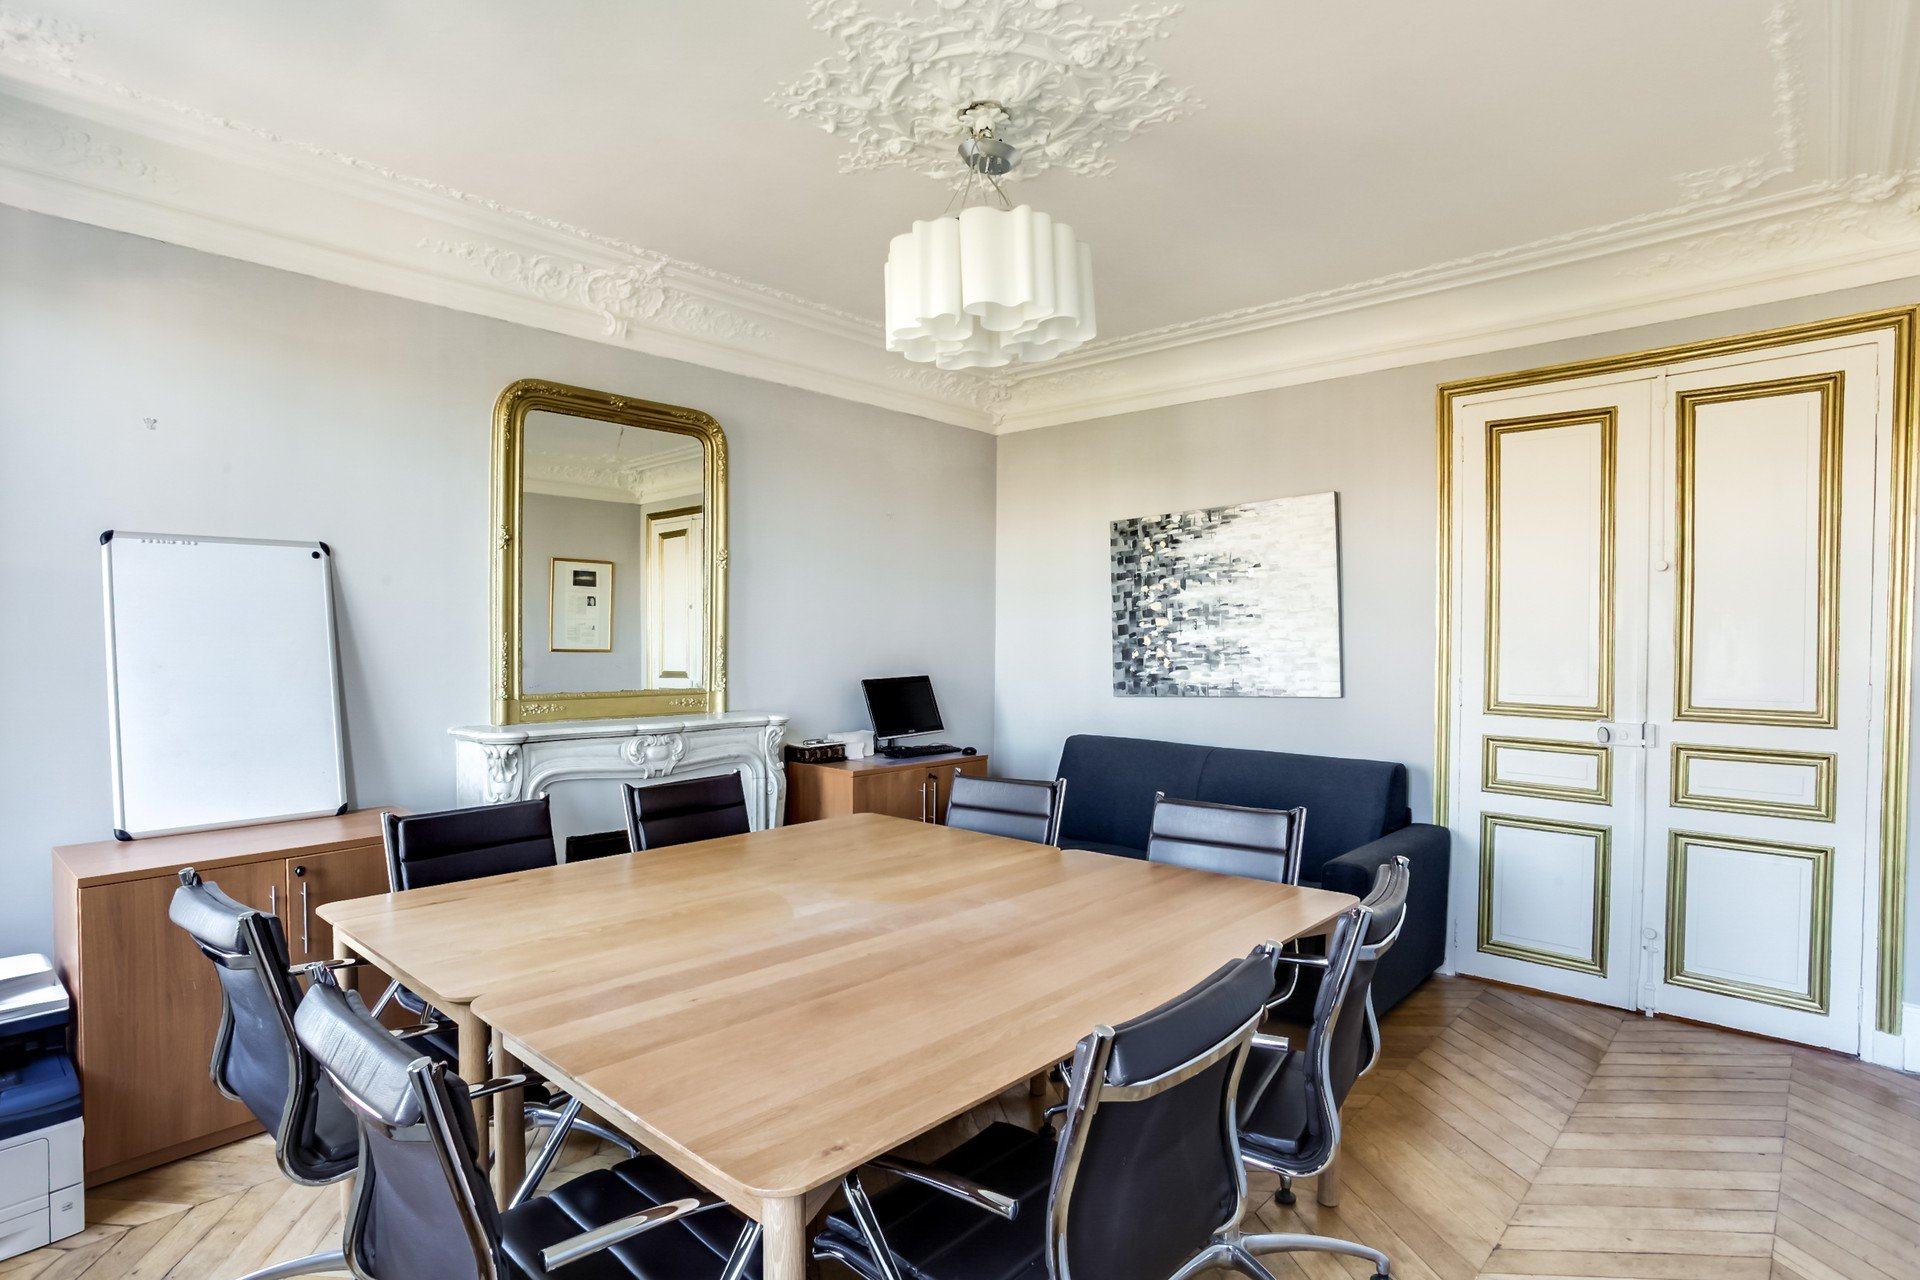 Paris training rooms Meetingraum Office Meeting Room with view Place de l'Etoile image 1